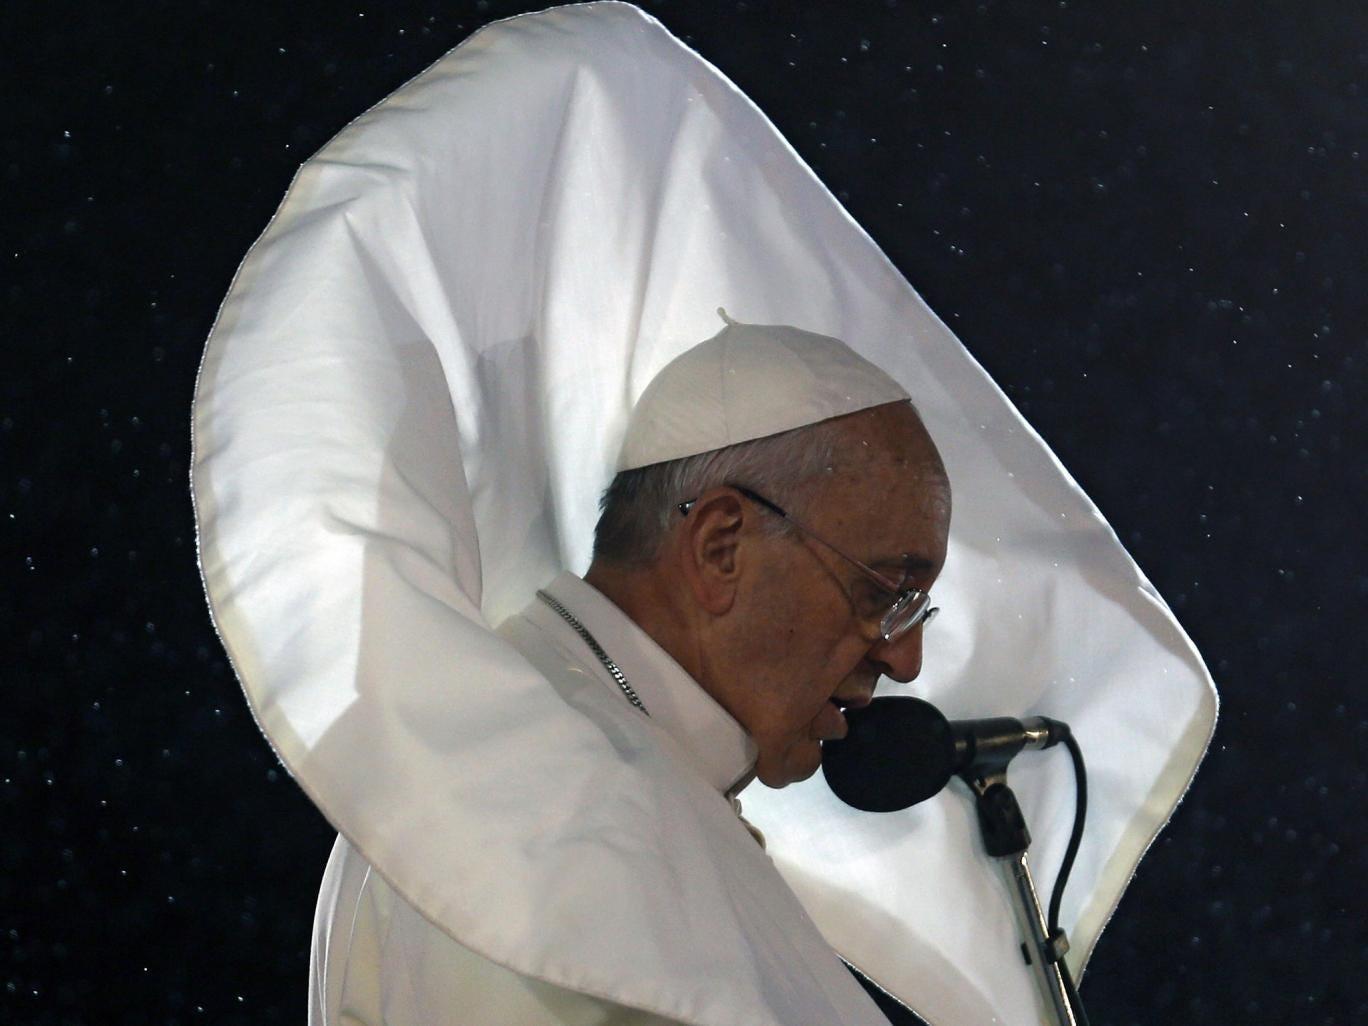 Pope Francis delivers a speech to Catholic faithful at Copacabana beach in Rio de Janeiro